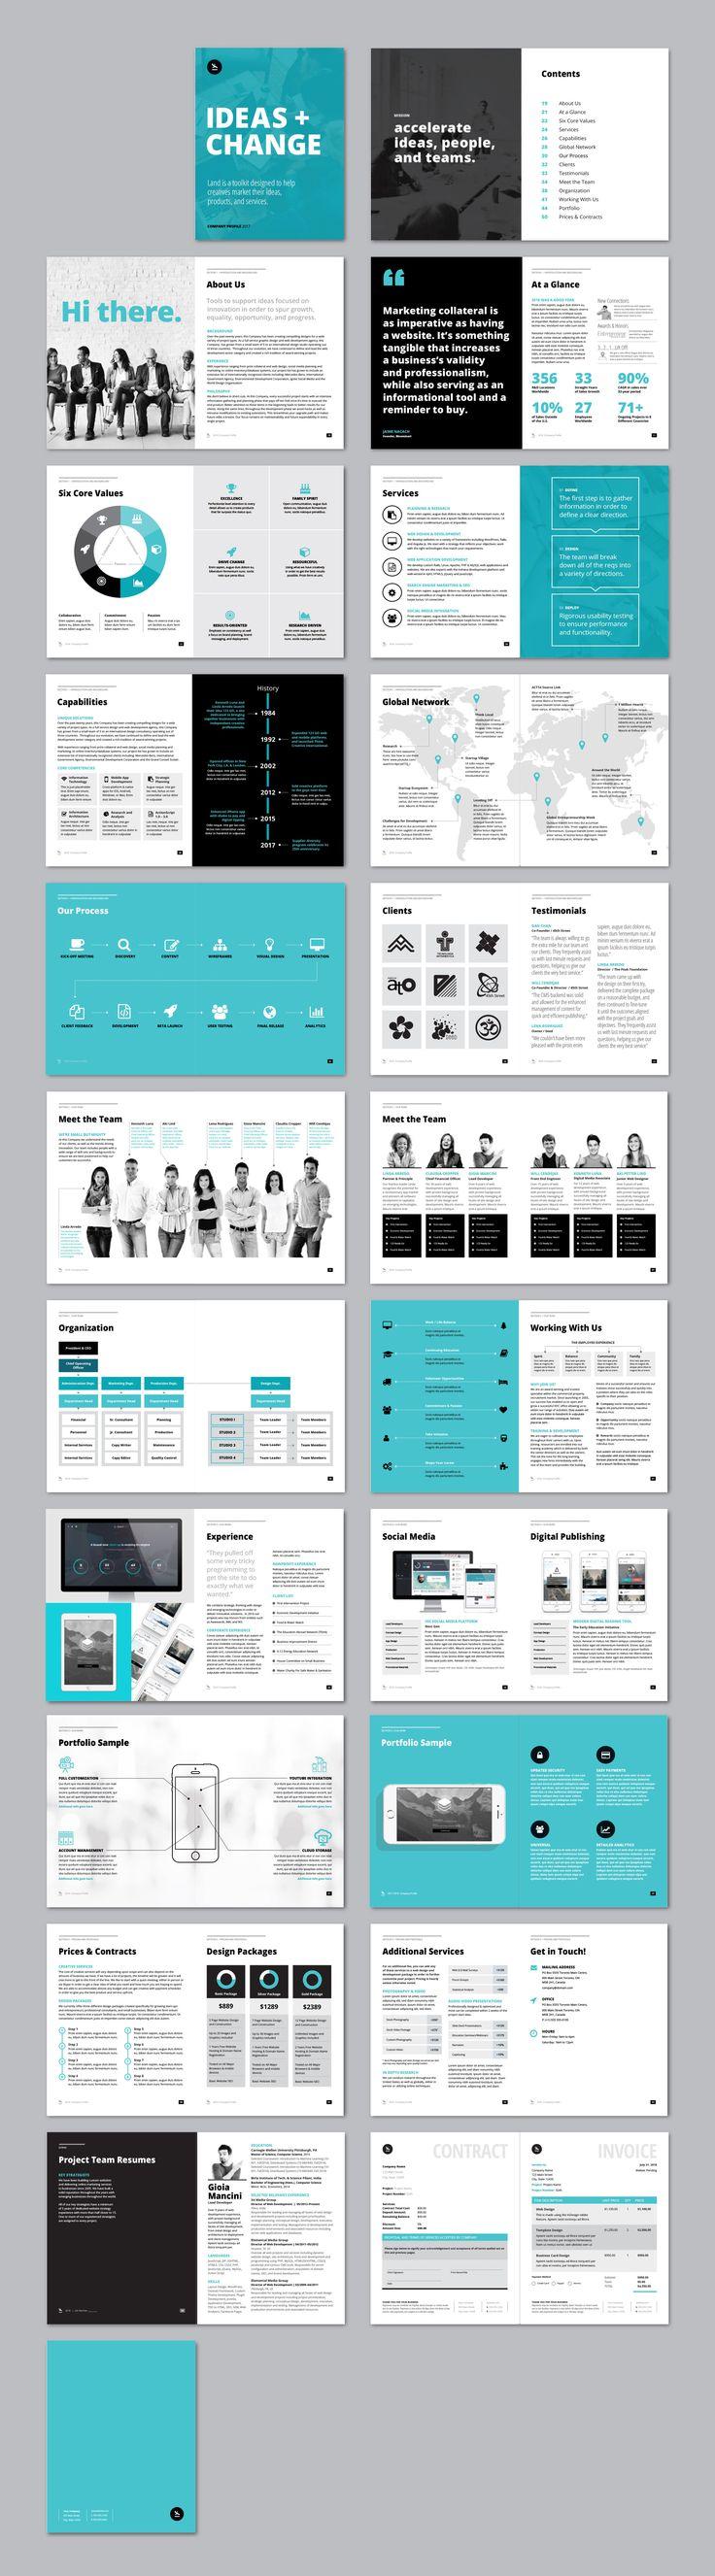 25 best ideas about Company profile design – Company Profile Template